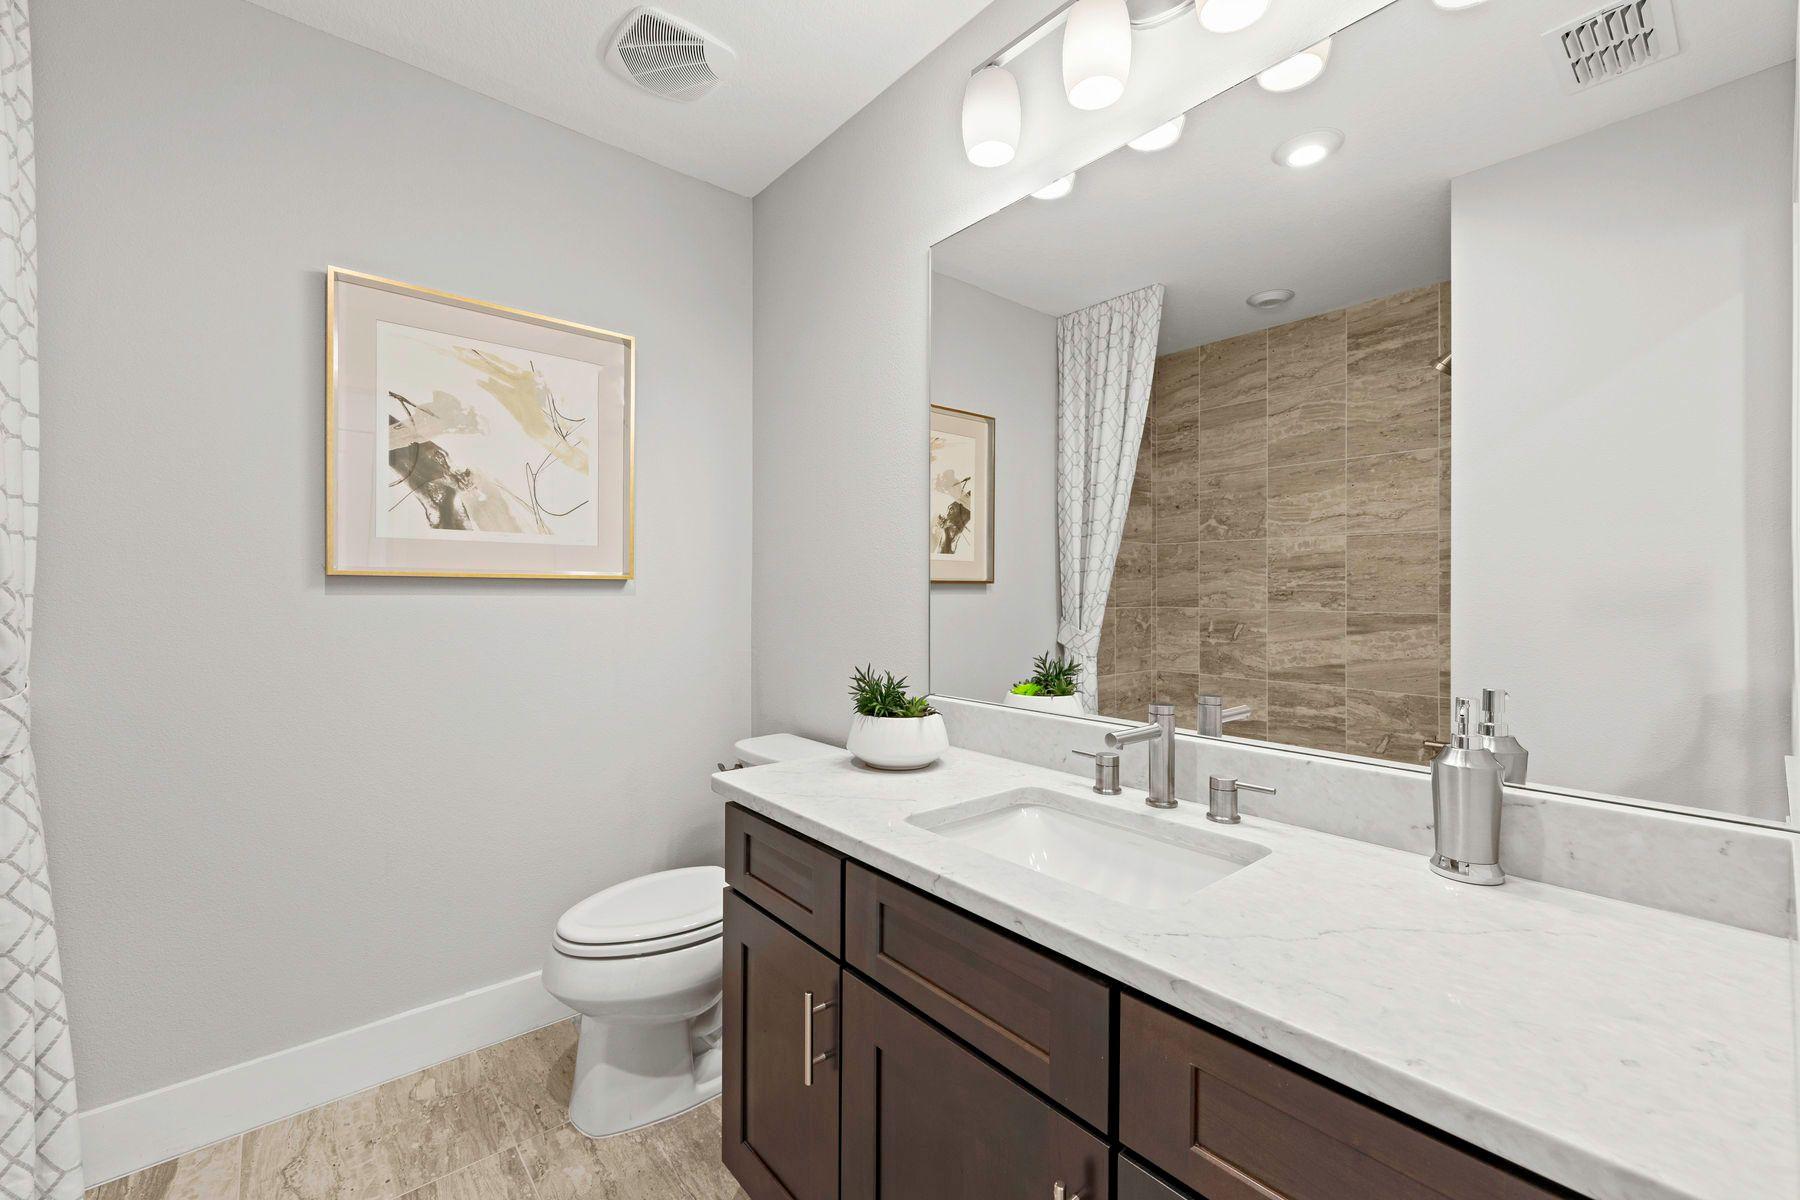 Bathroom featured in the Sandbar By Mattamy Homes in Naples, FL